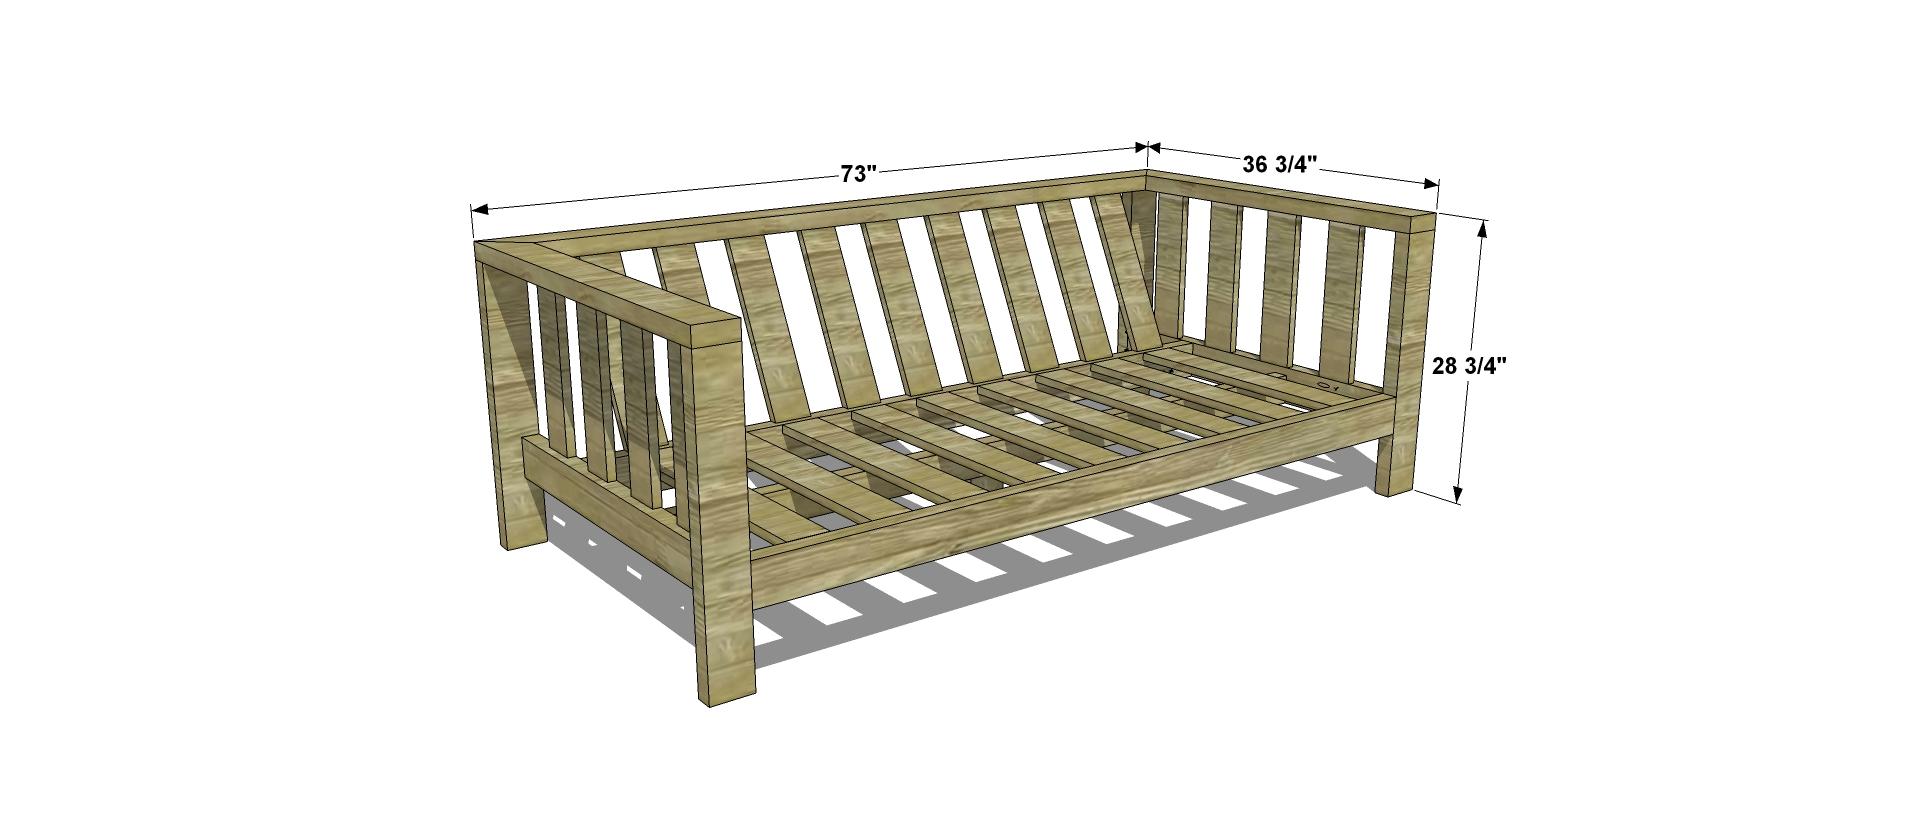 Sofa Frame Designs Plans Diy Free How To Build Corner